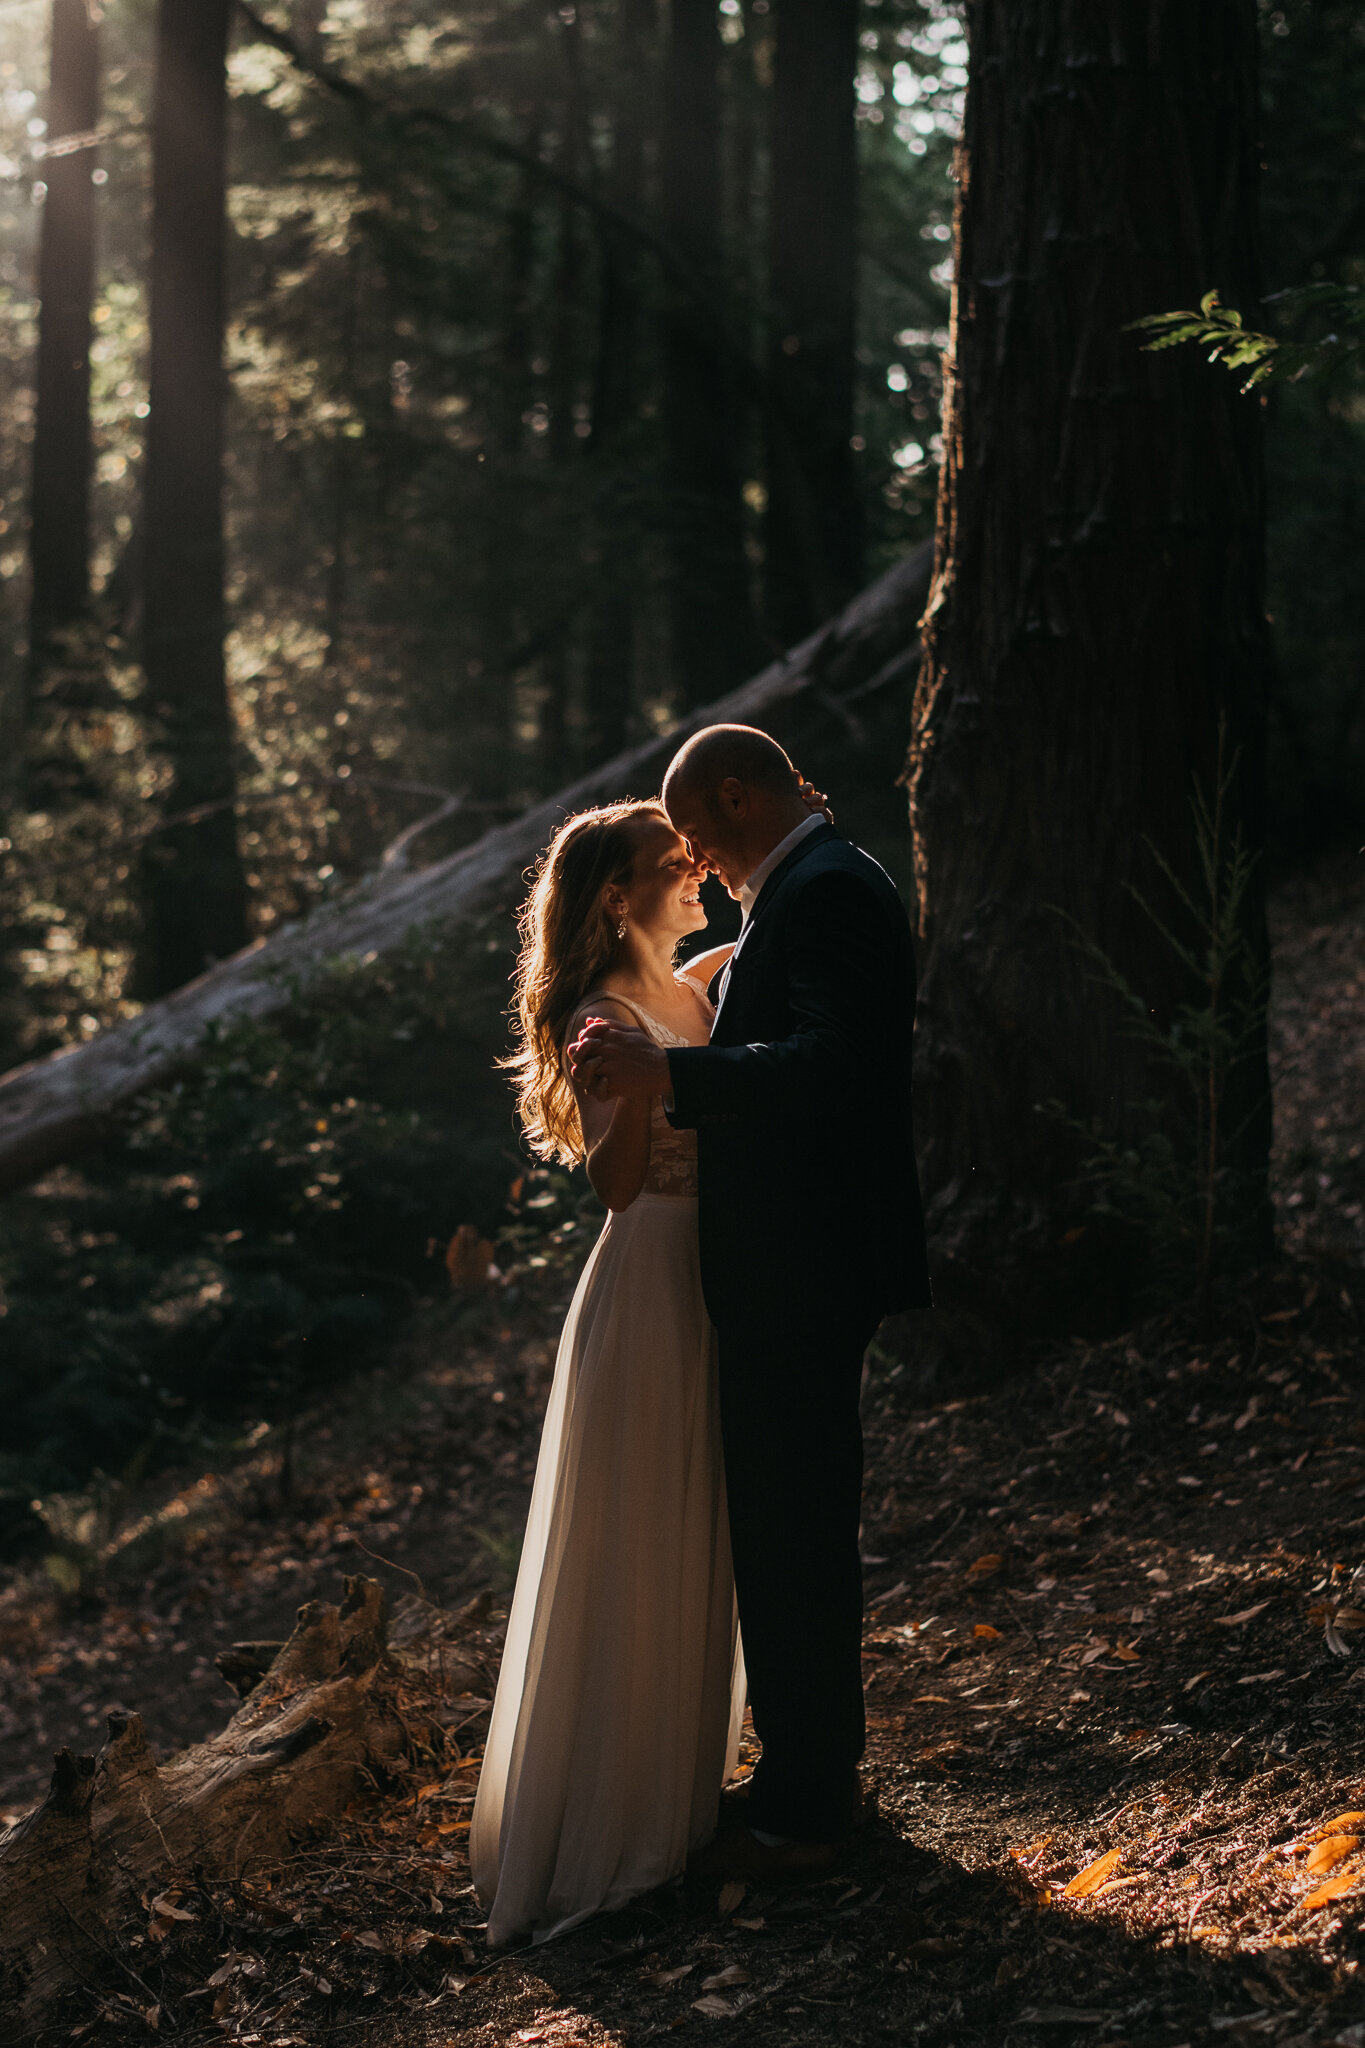 Cailfornia wedding photographer-19.jpg